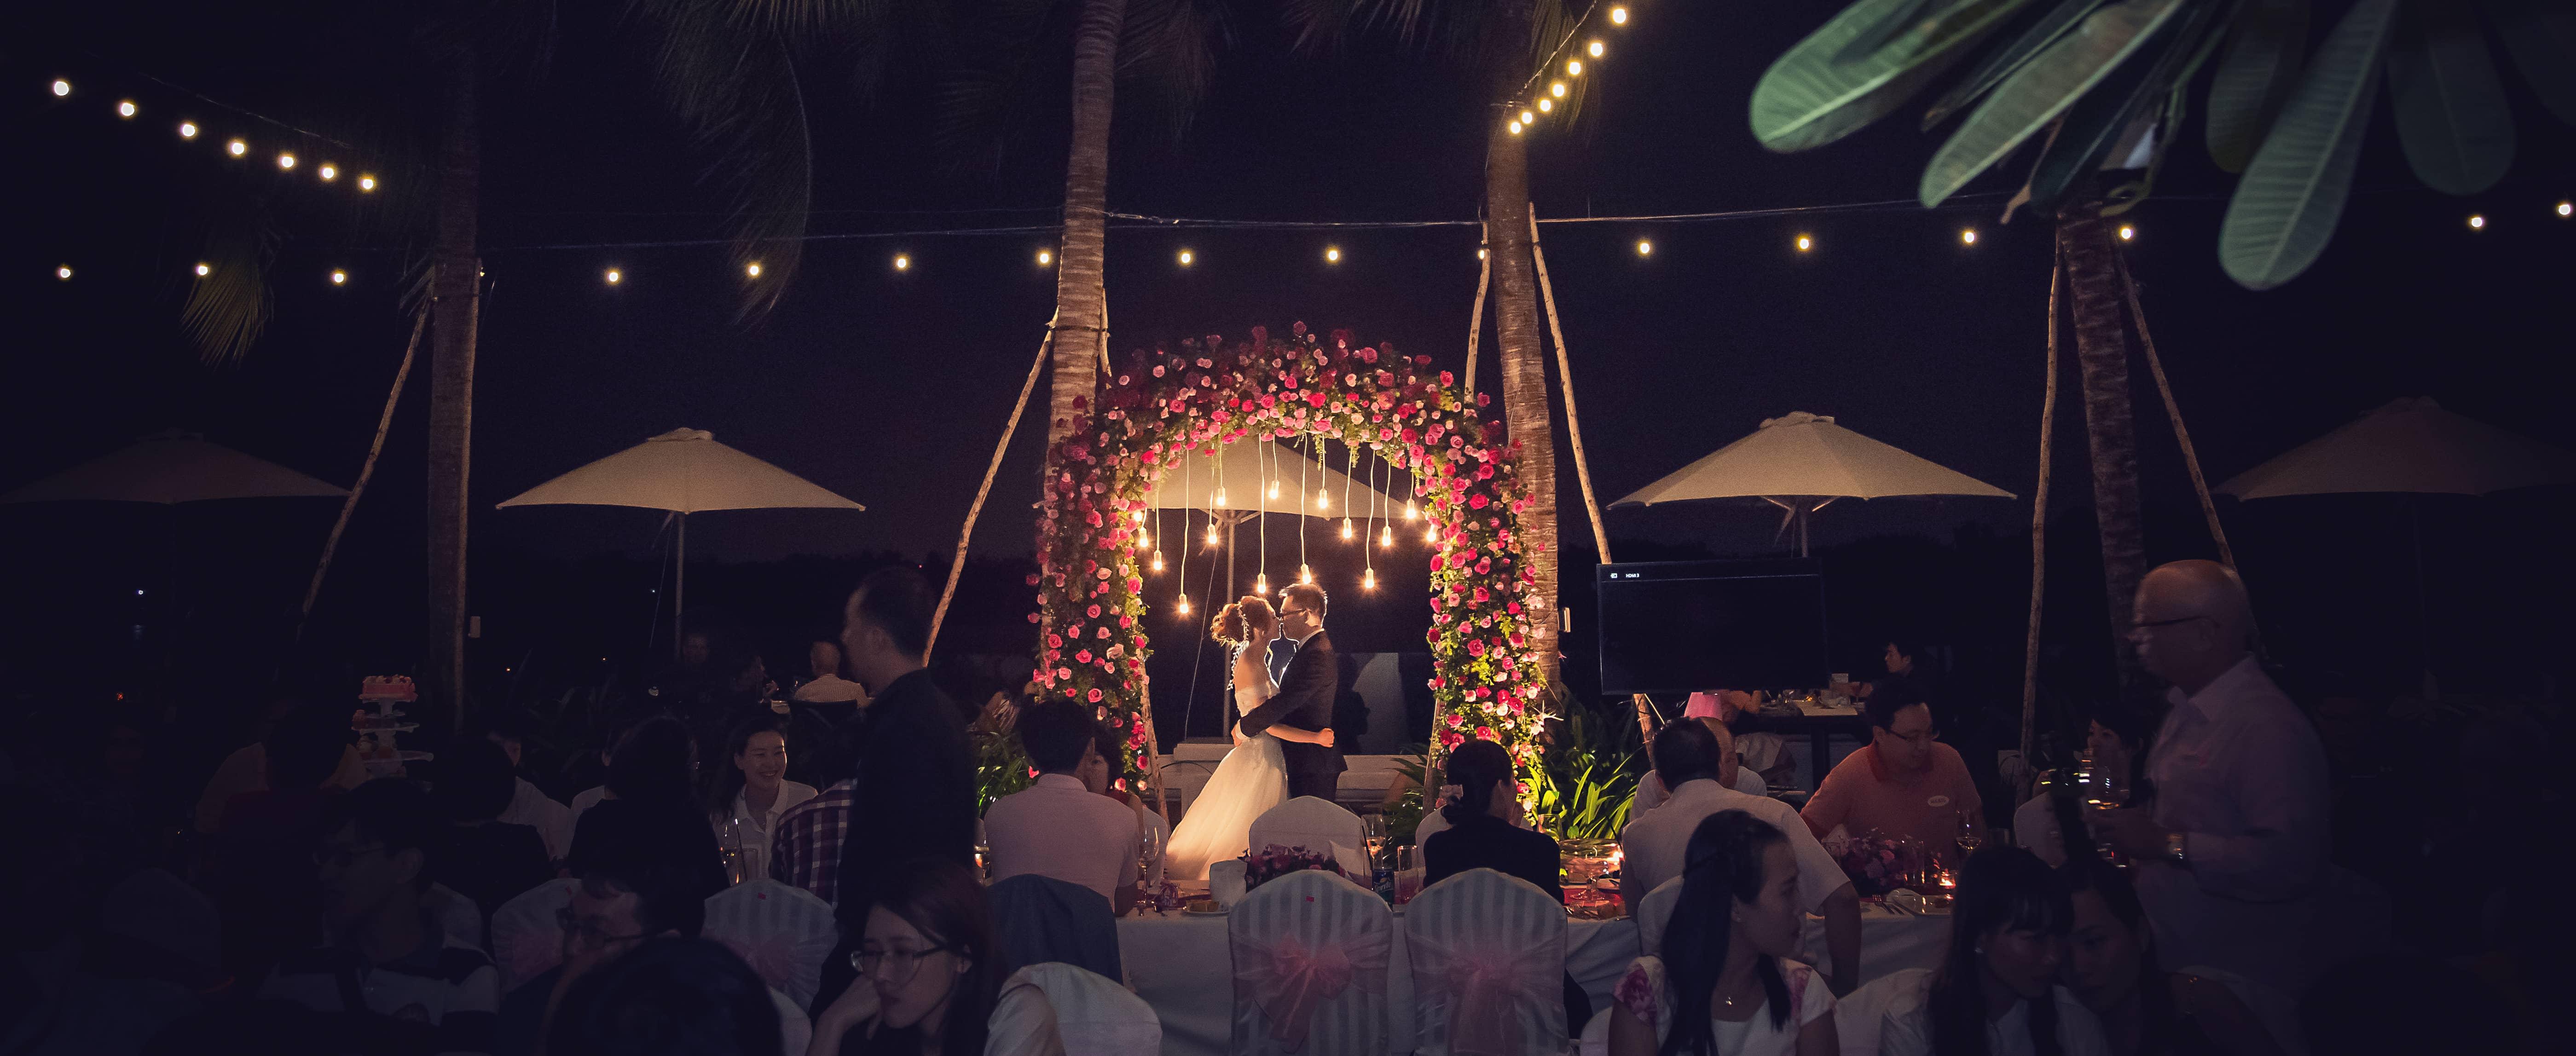 villa 婚禮,Vietnam wedding,Villa Song Saigon,海外婚禮,台北婚攝,婚禮攝影推薦,婚禮記錄,overseas wedding,自主婚紗,婚禮攝影,海外婚禮婚紗,戶外婚禮